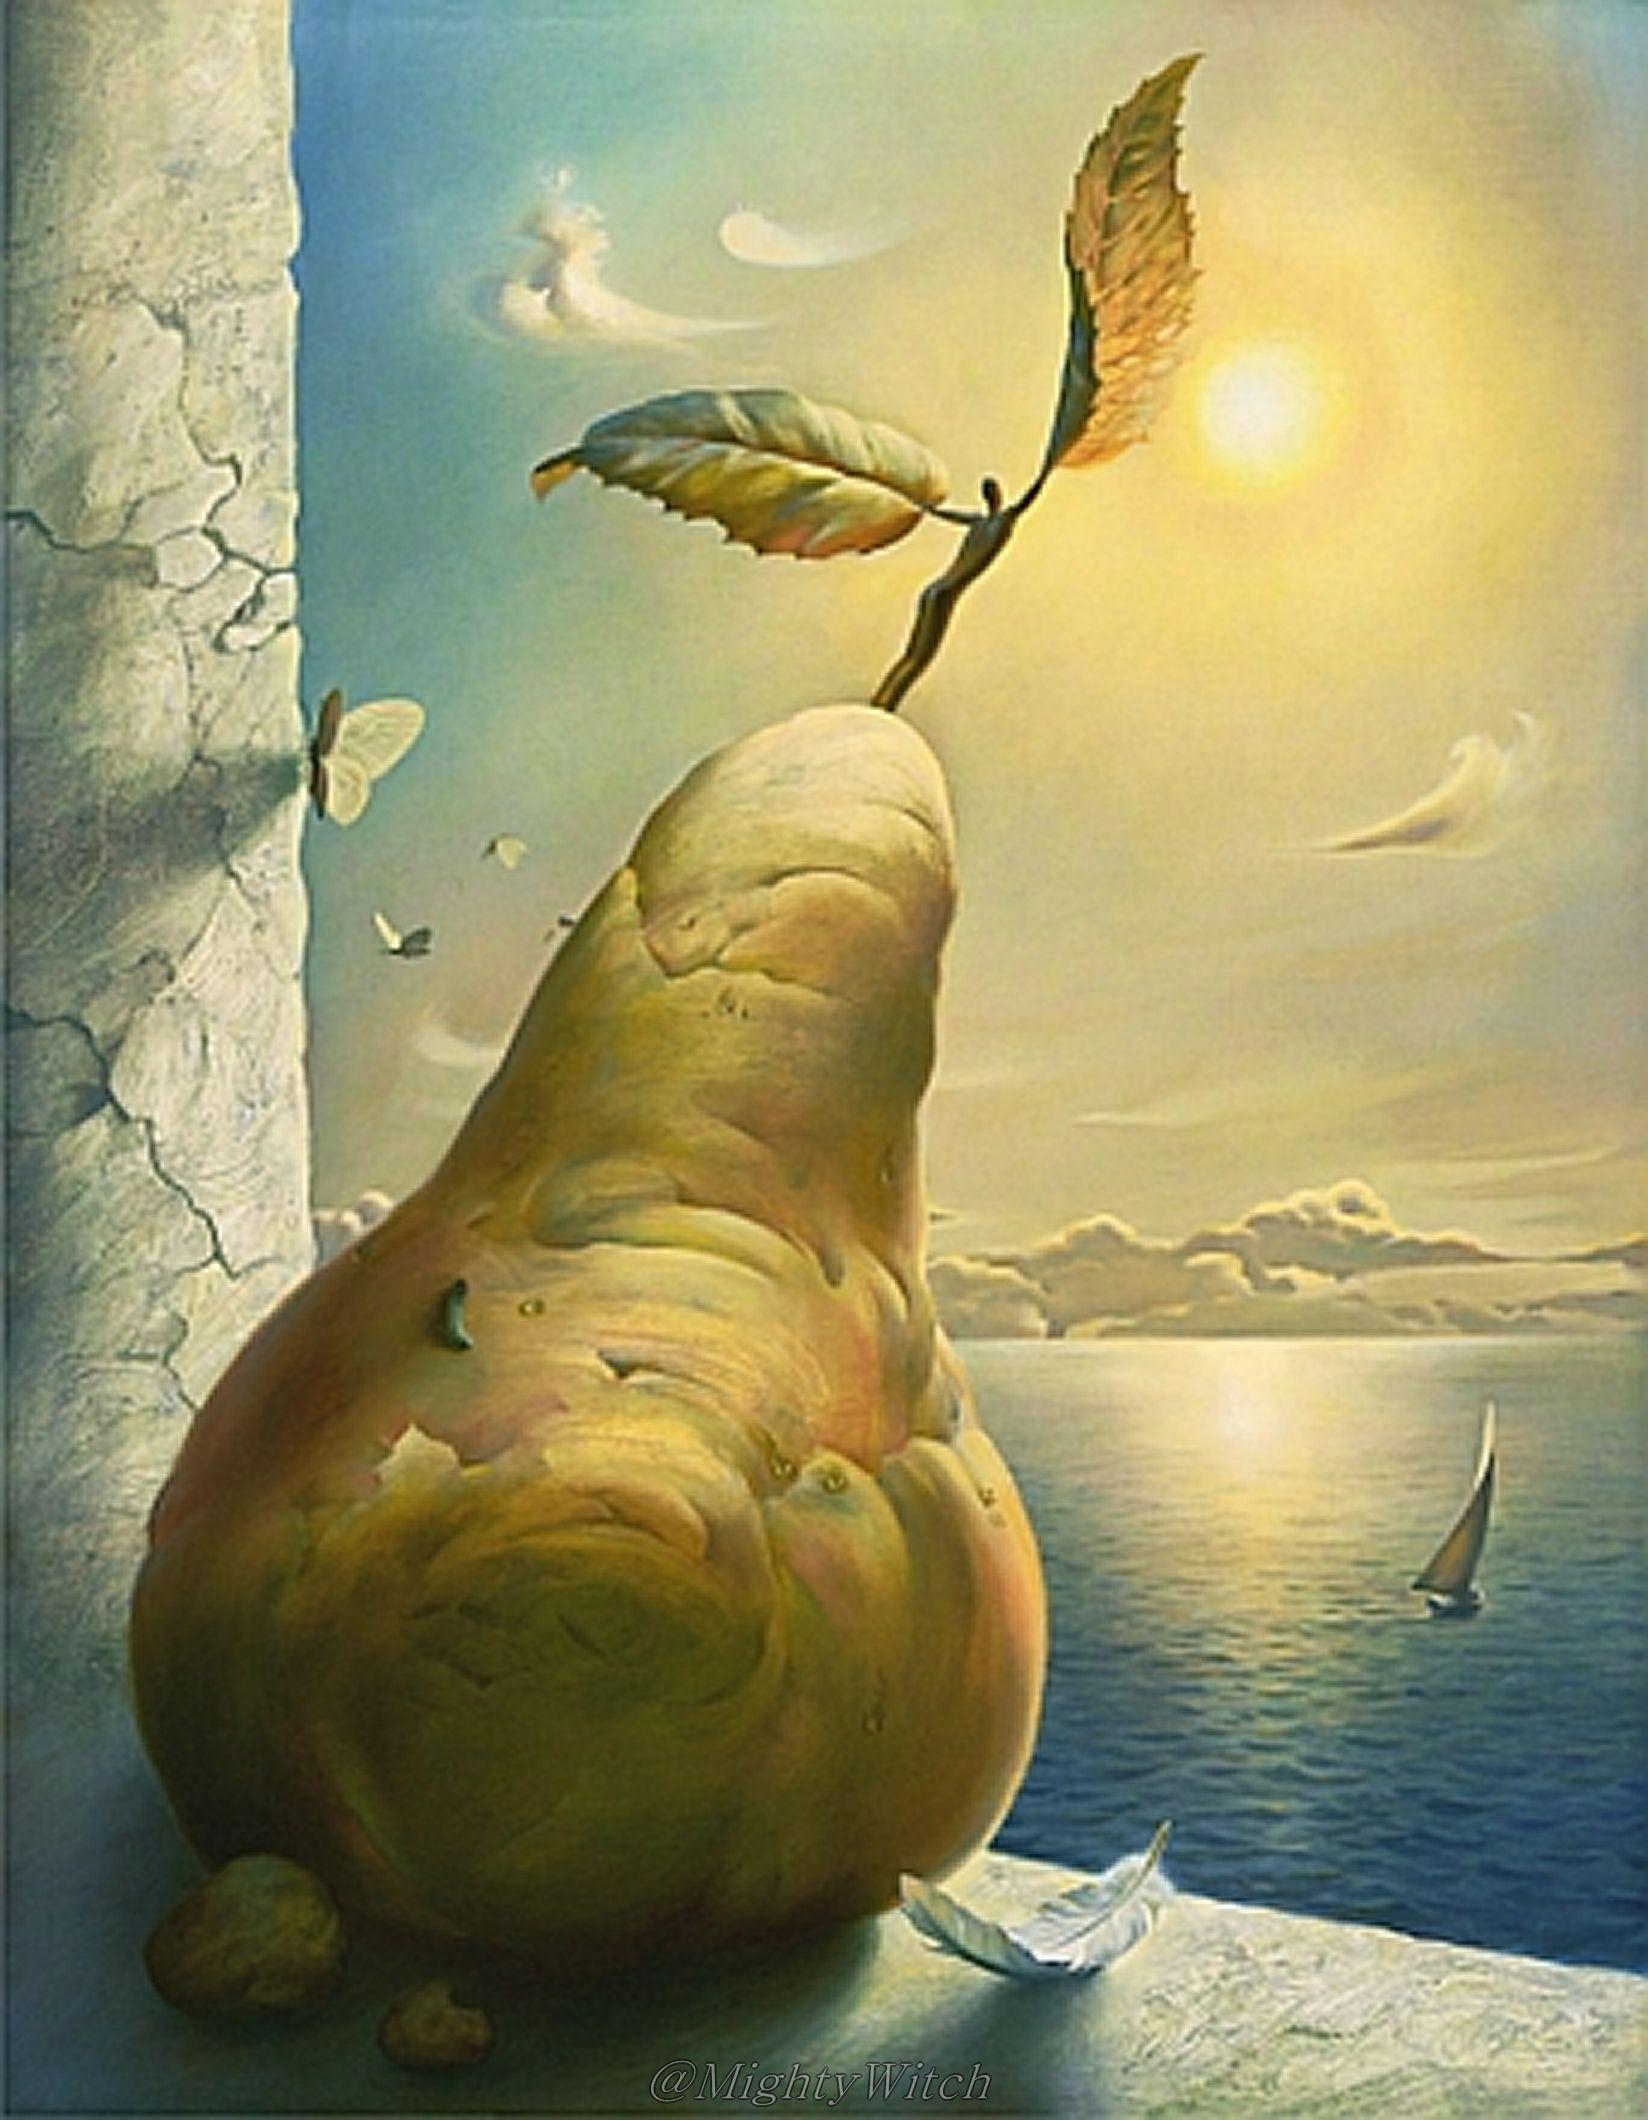 Icarus by Vladimir Kush.